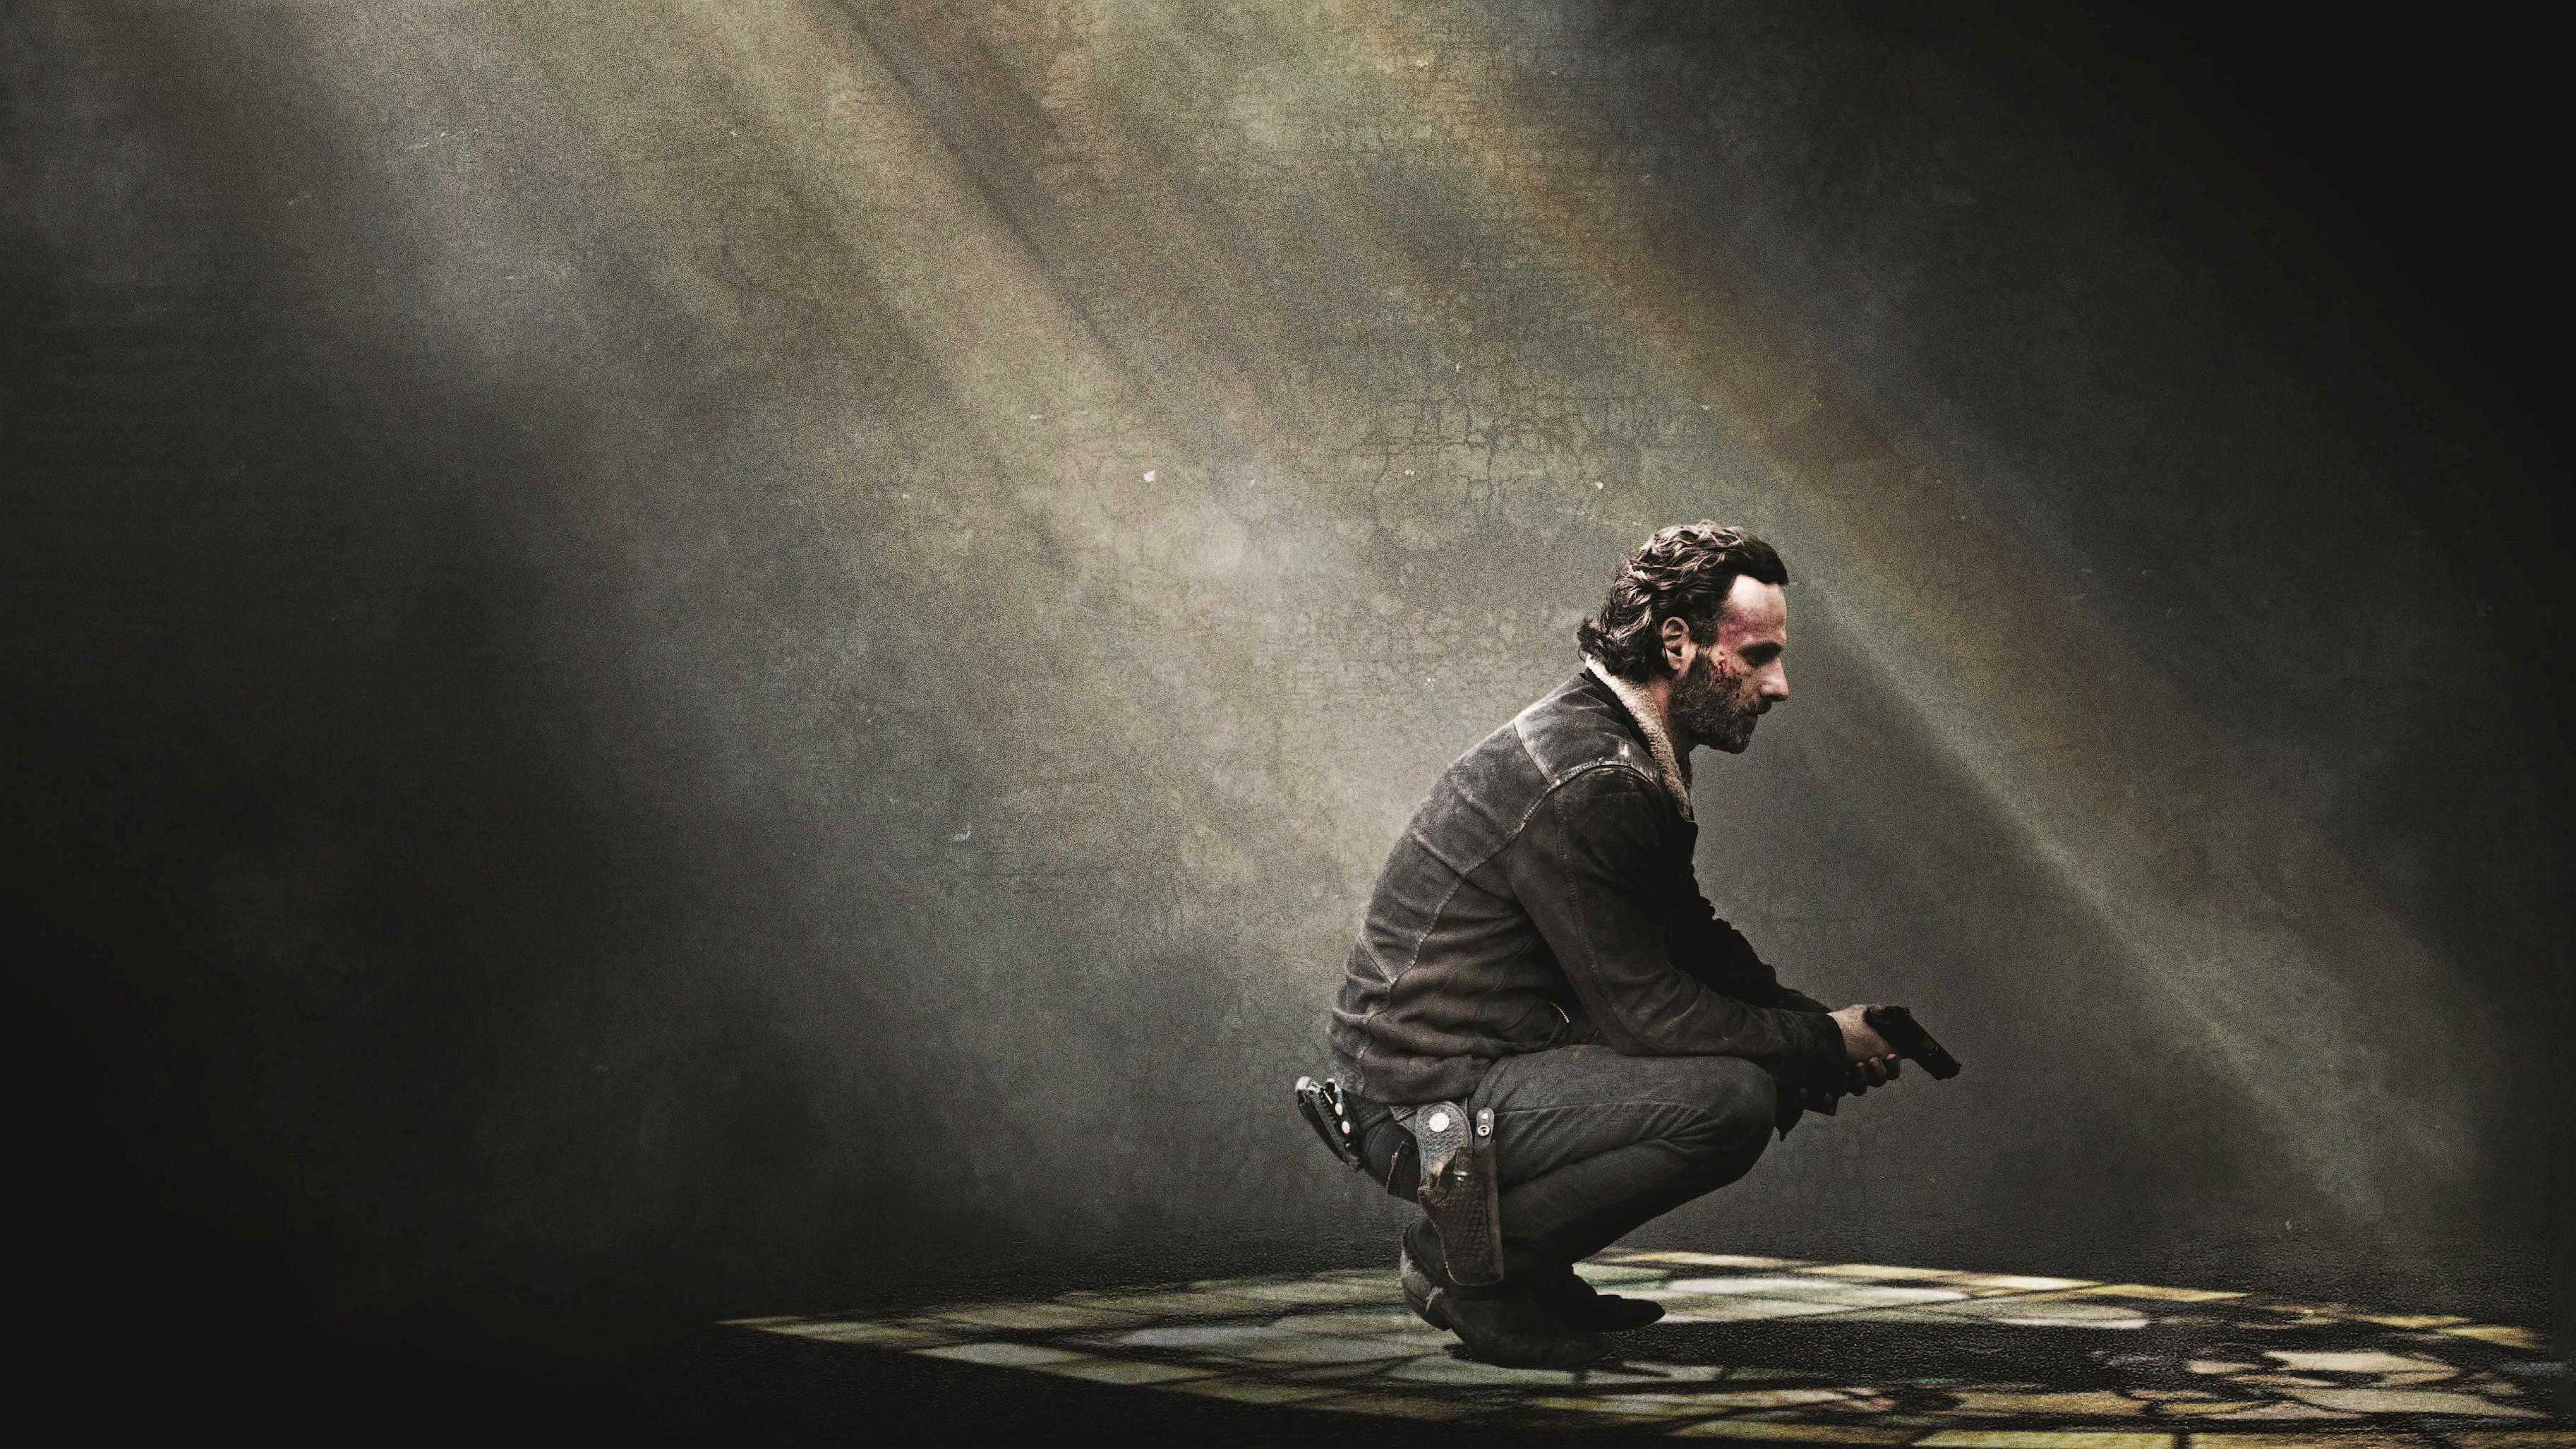 Walking Dead Wallpaper For Android: 1920x1080 Rick Grimes The Walking Dead Laptop Full HD